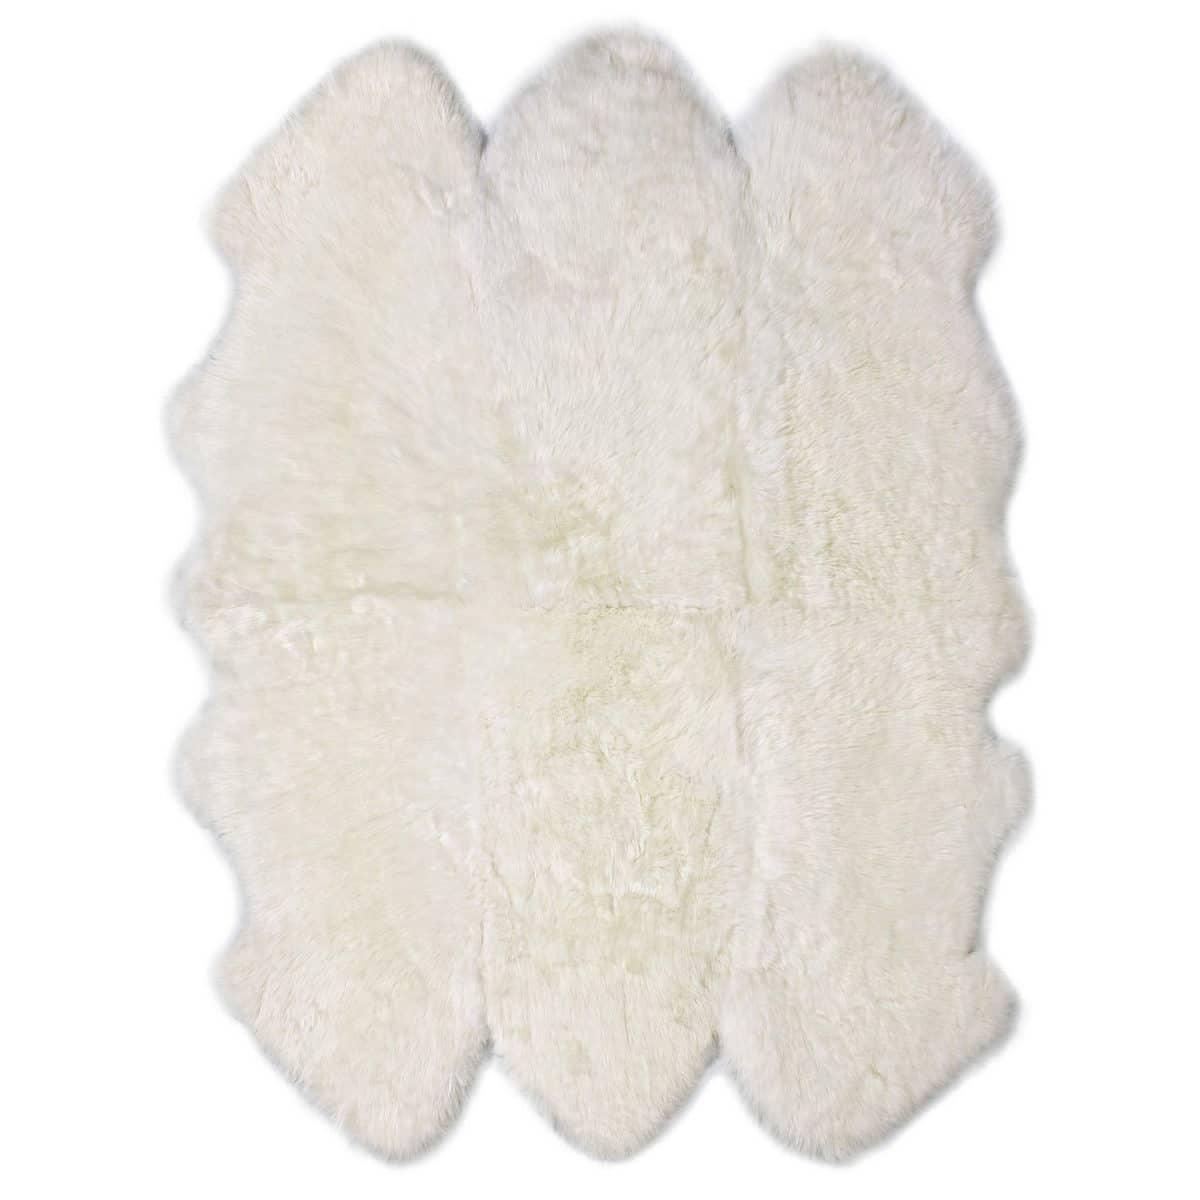 Natural Ivory Sexto Sheepskin Rug